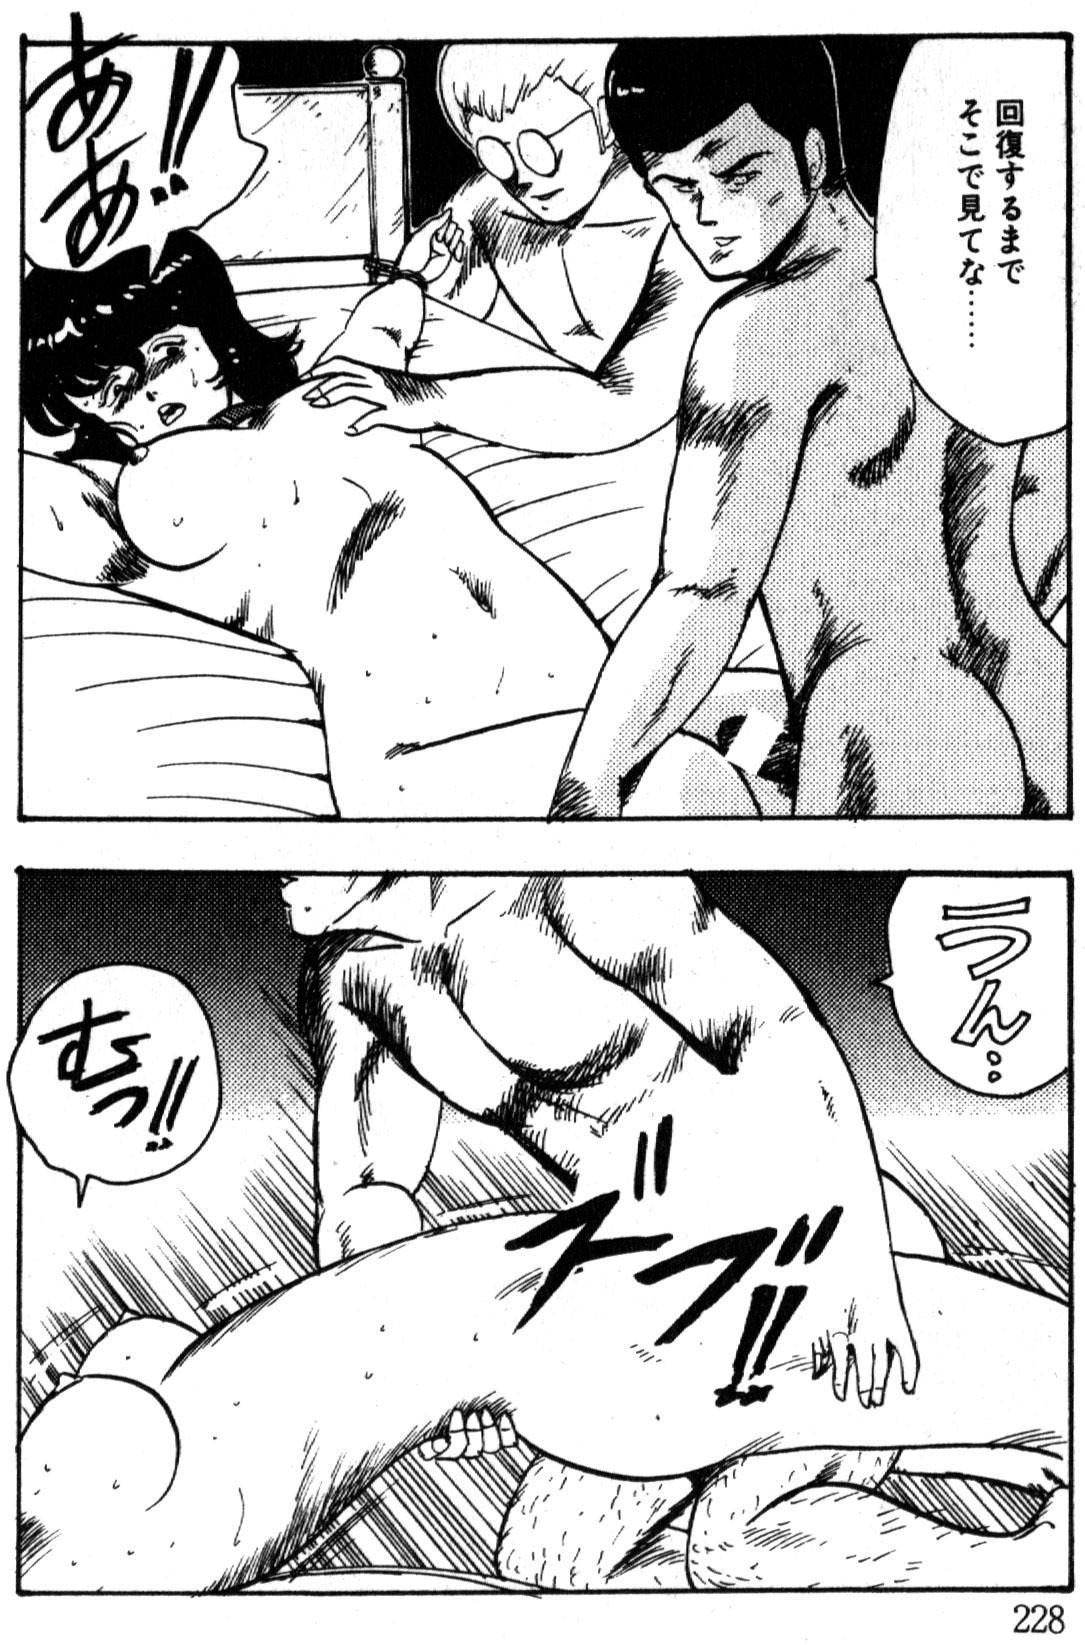 Keiko Sensei no Kagai Jugyou - Keiko Sensei Series 1 227